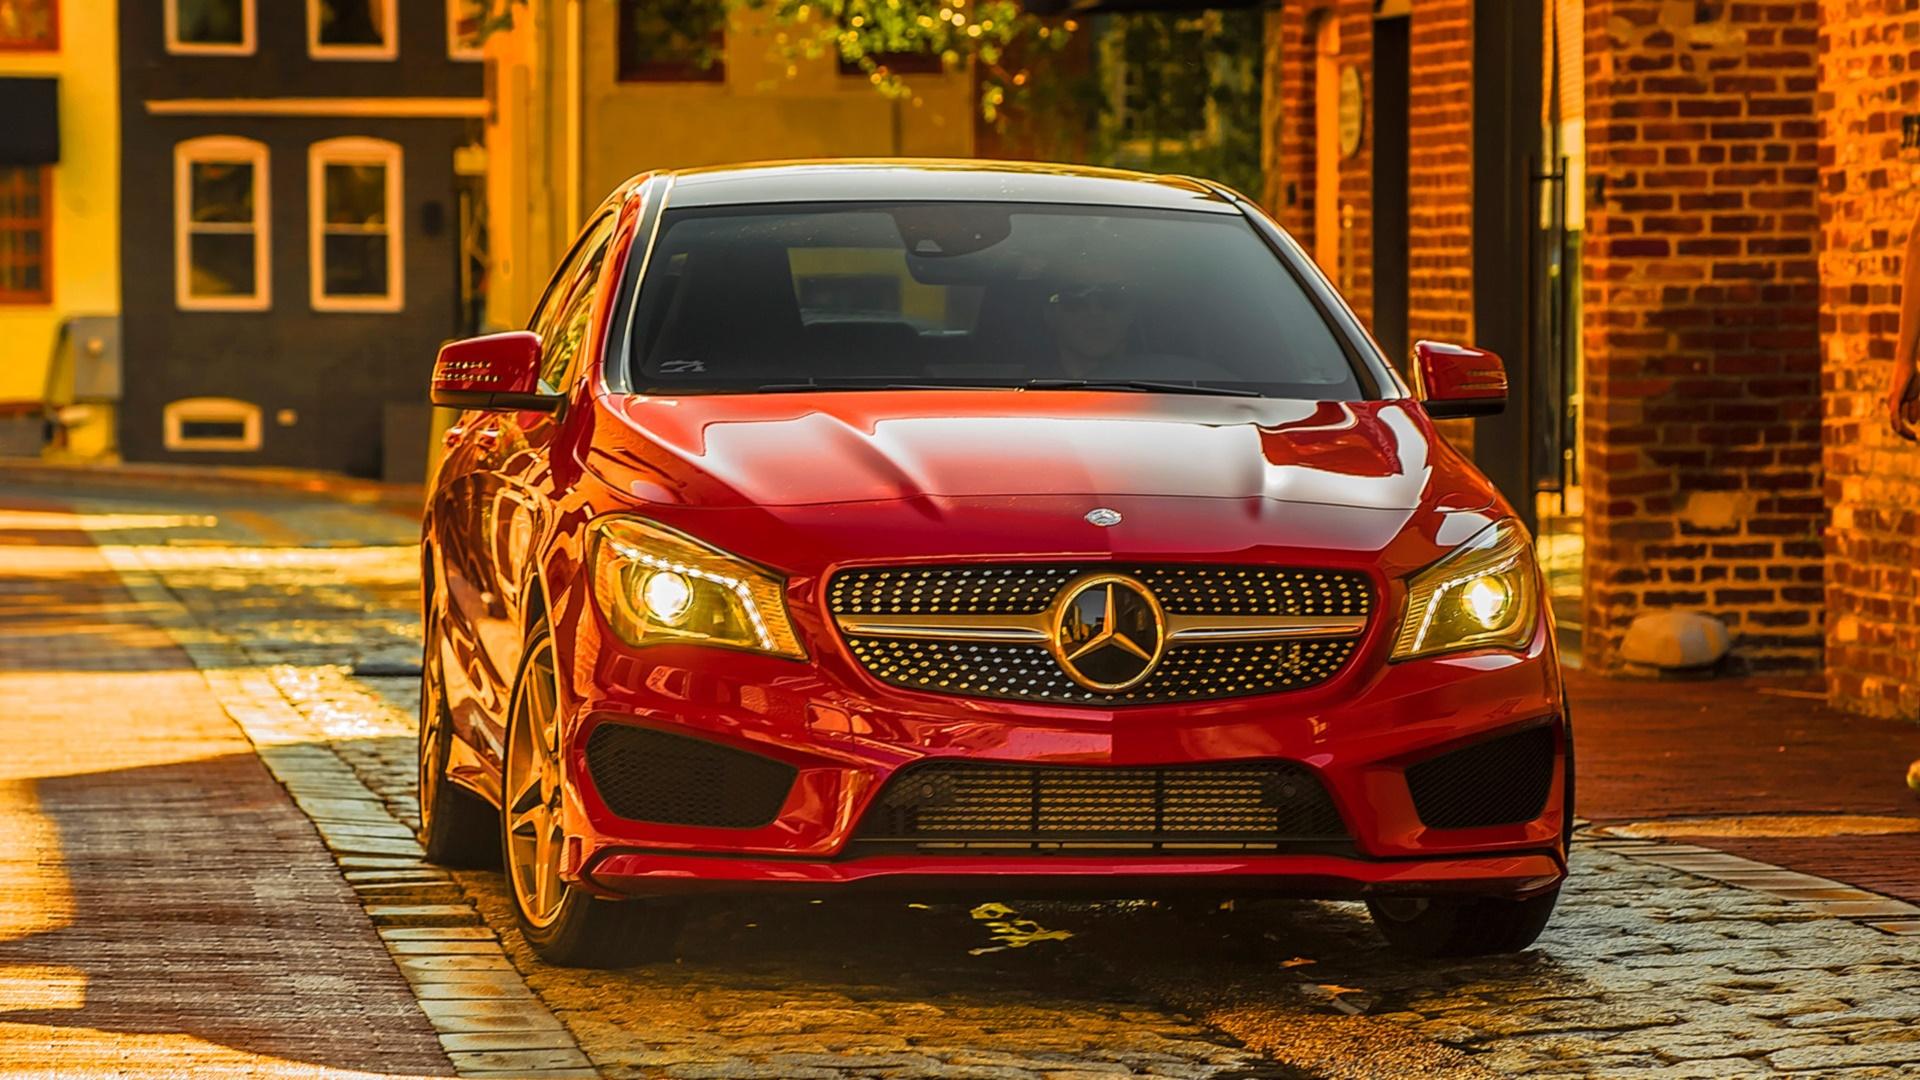 Hd Car Wallpapers 1600x1200 16 Mercedes Benz Cla Class Hd Wallpapers Backgrounds